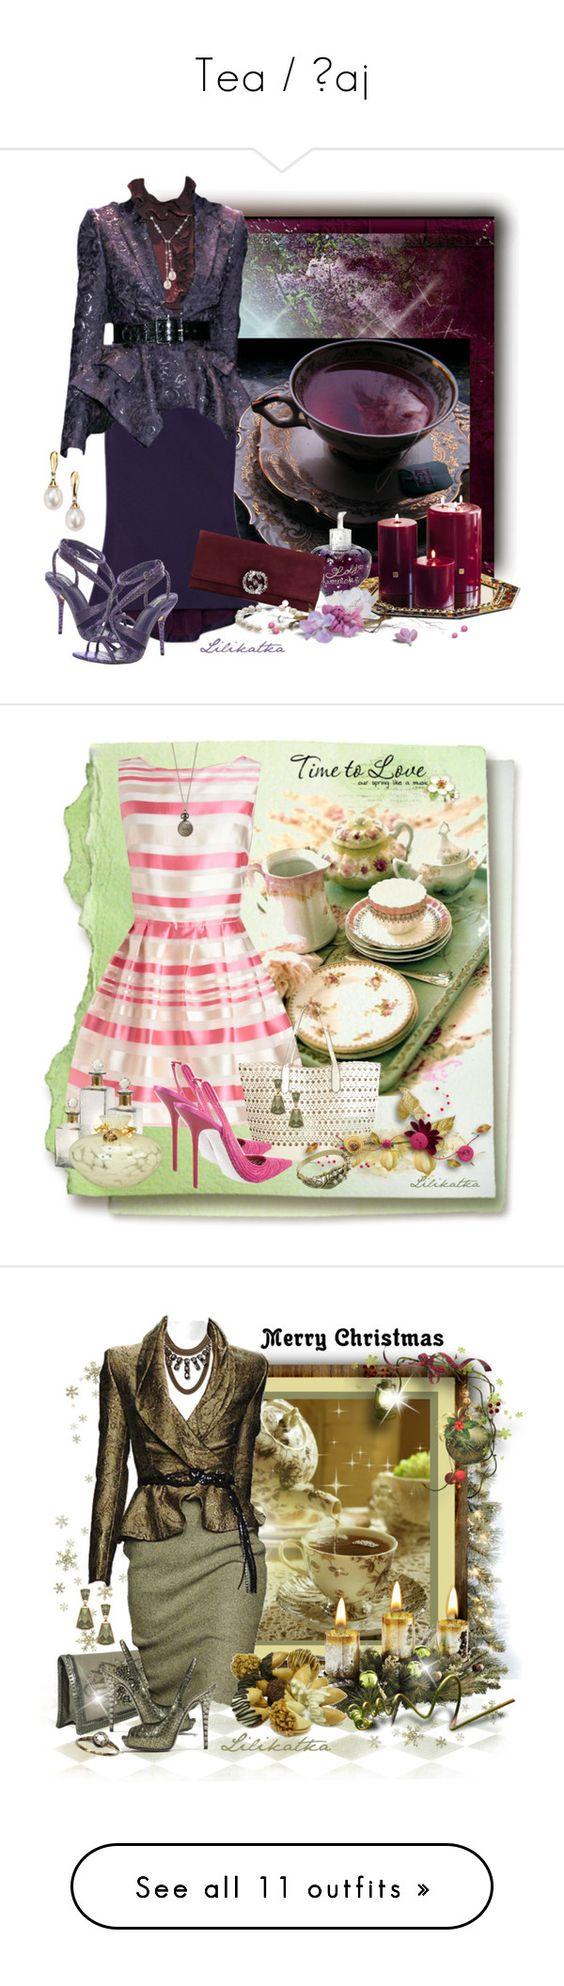 """Tea / Čaj"" by lilikatka ❤ liked on Polyvore featuring Zac Posen, Gucci, Lolita Lempicka, Blue Nile, Chanel, Swesky, Max Studio, women's clothing, women and female"